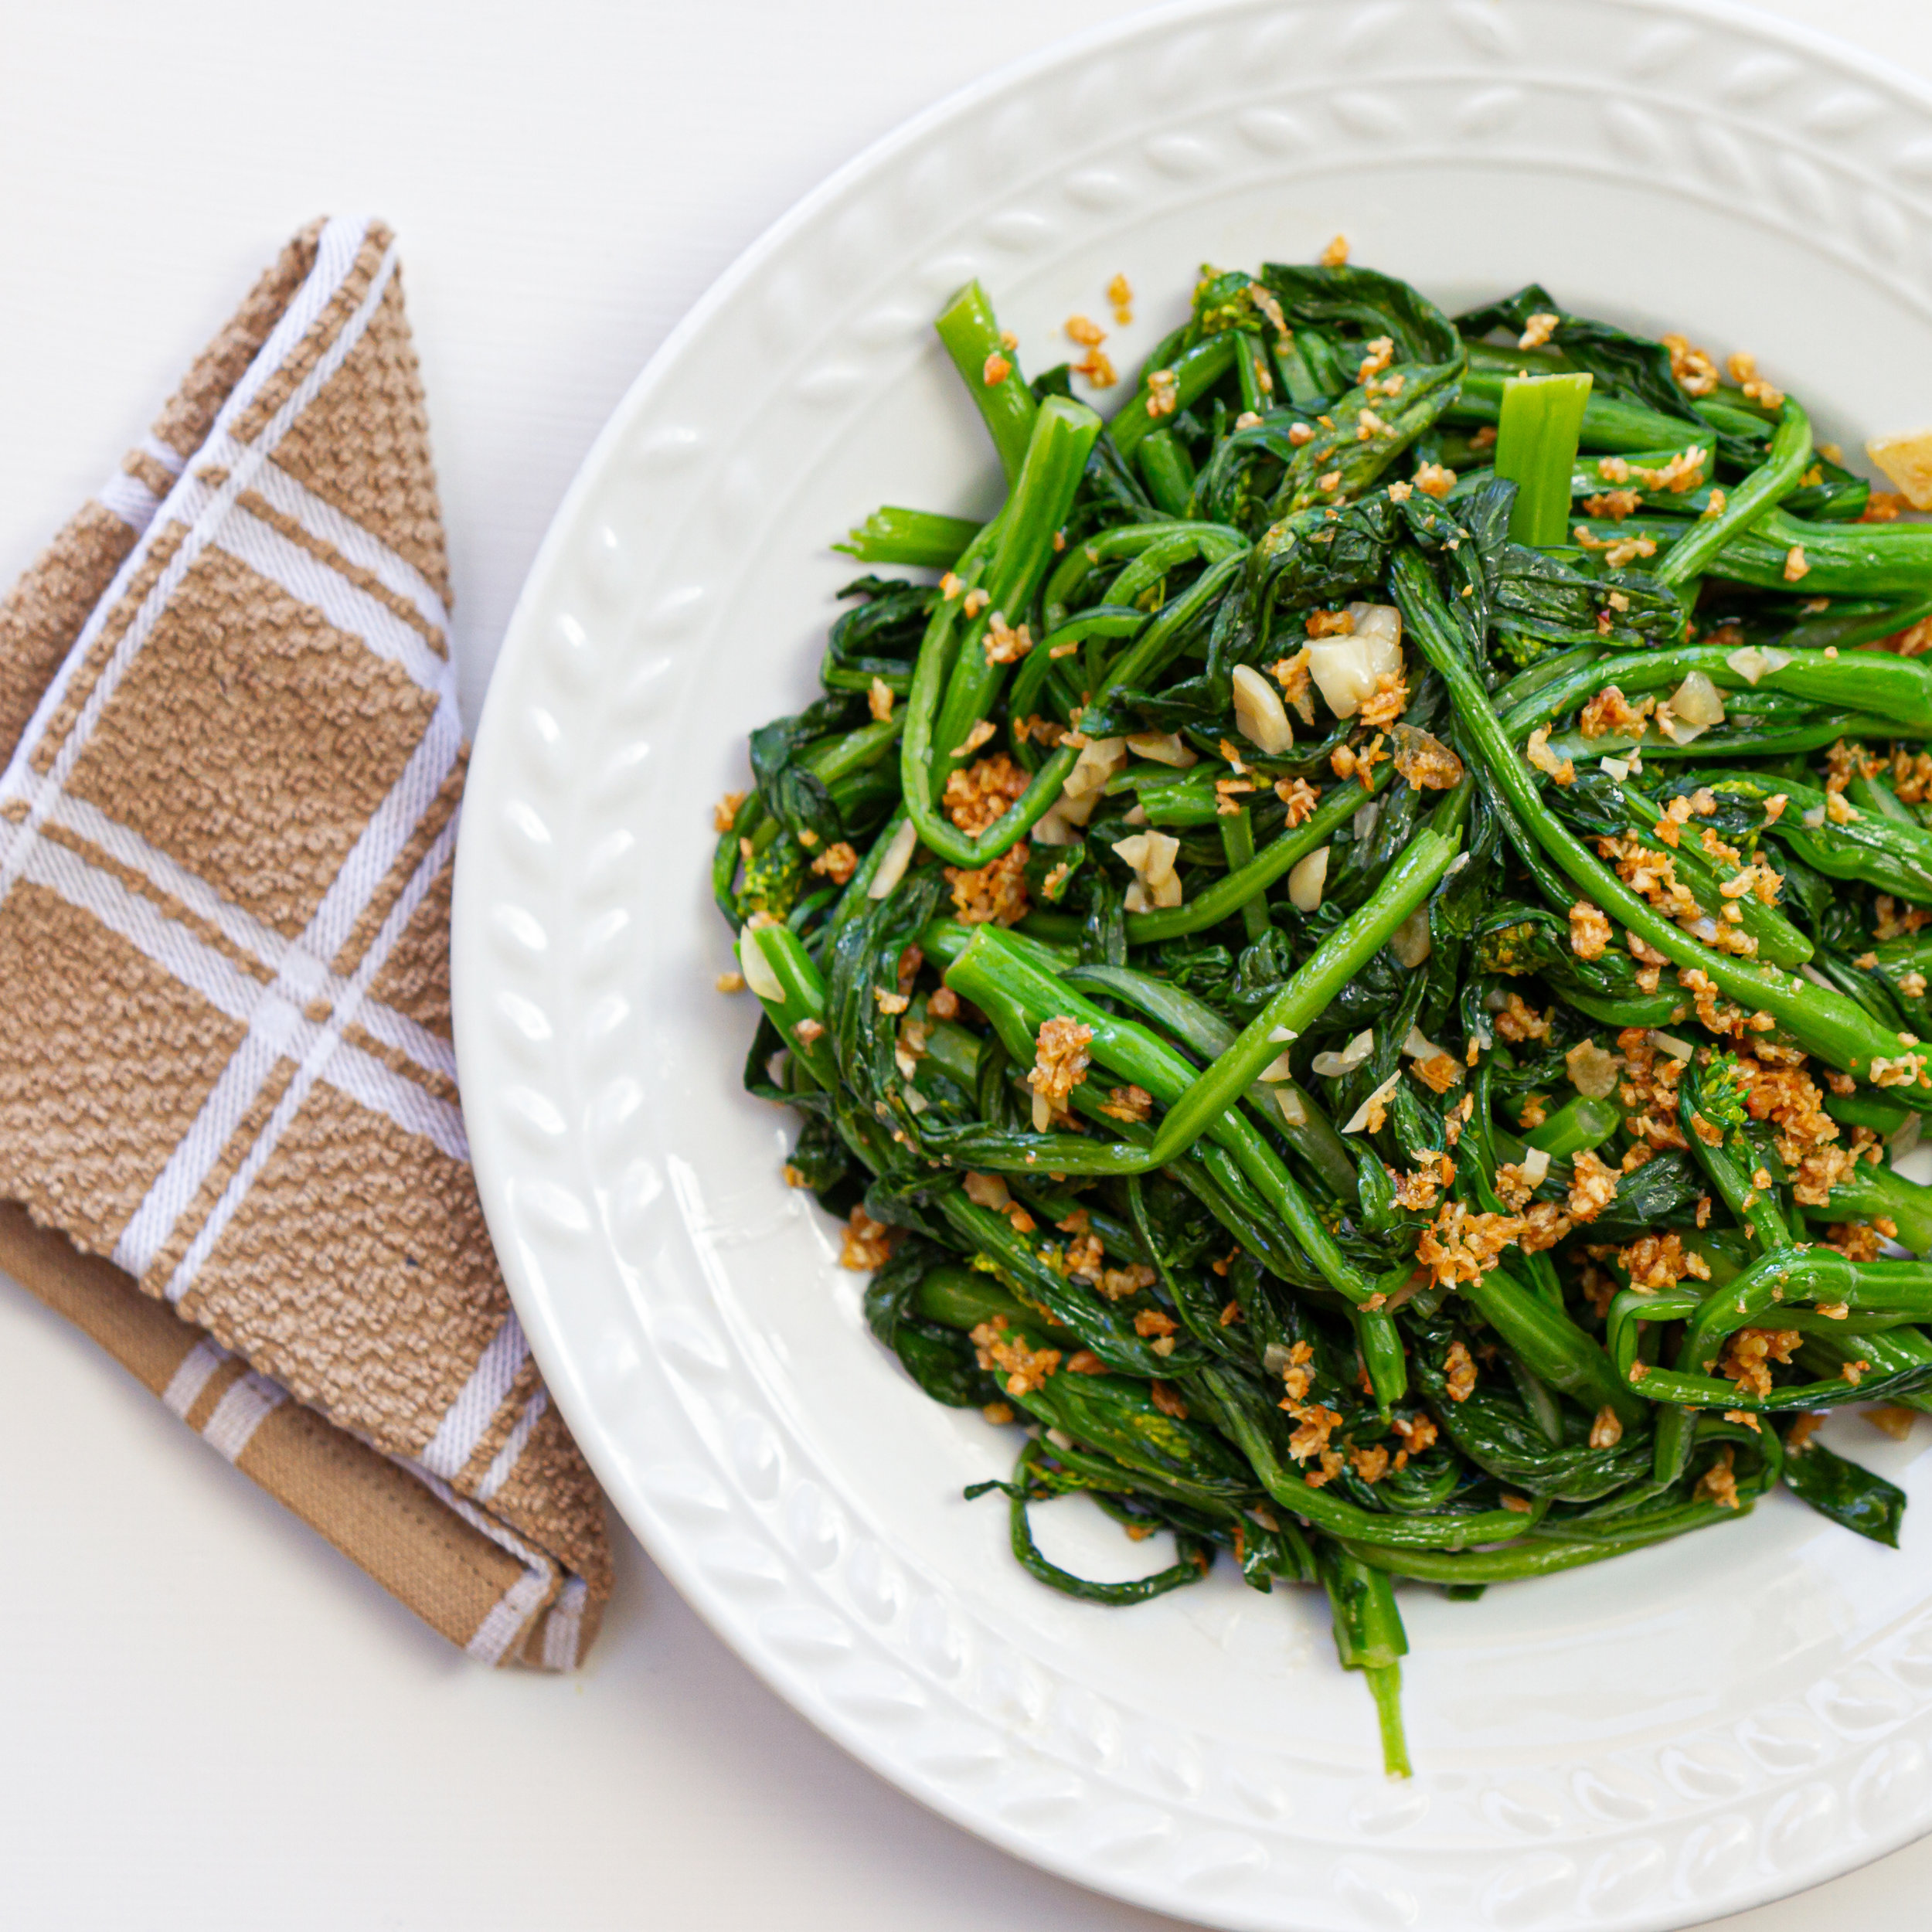 Simple Choy Sum & Garlic Stir-Fry (Cai Lan Xao Toi)